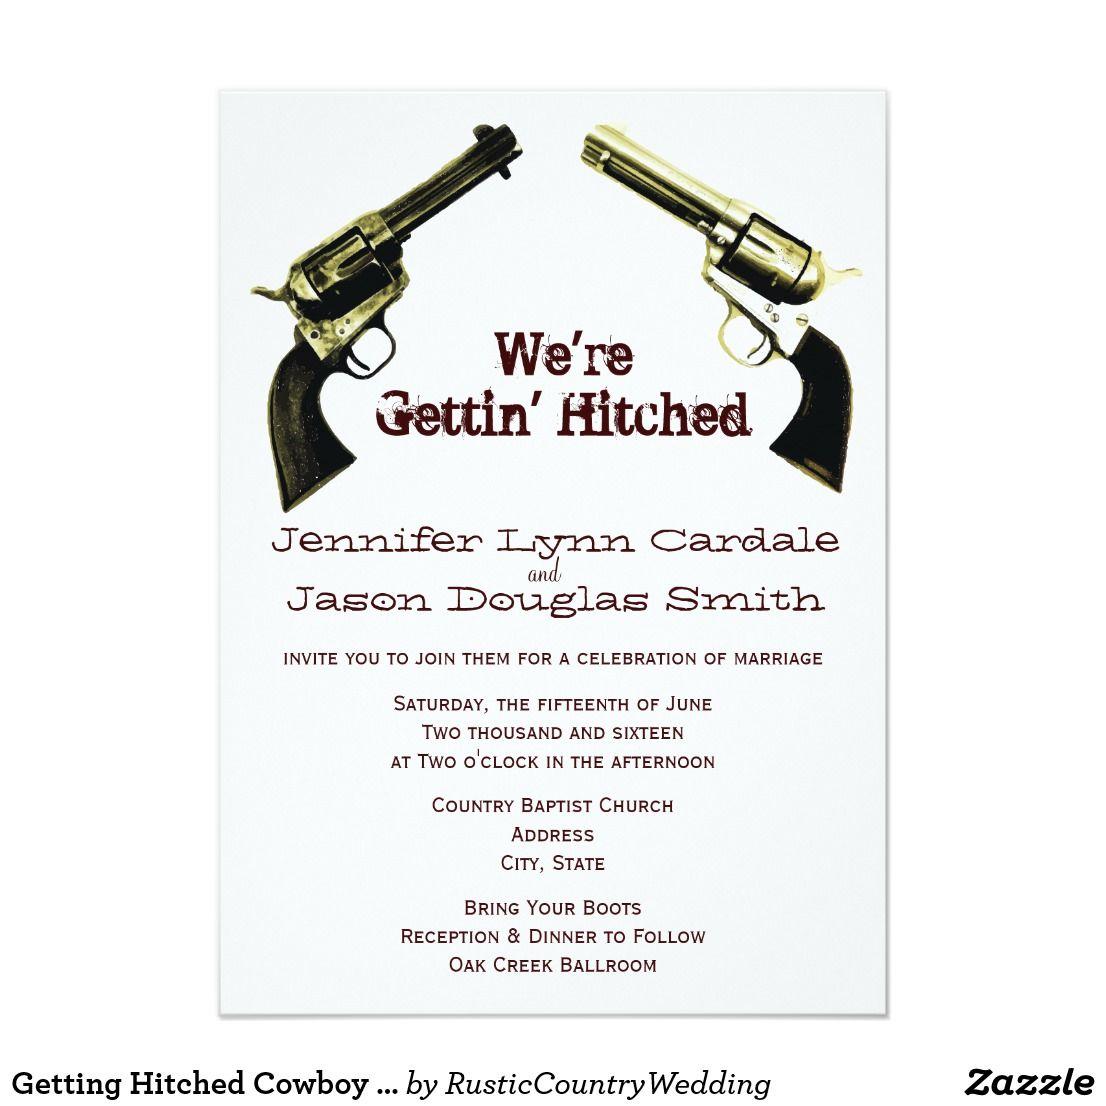 Getting Hitched Cowboy Guns Wedding Invitations